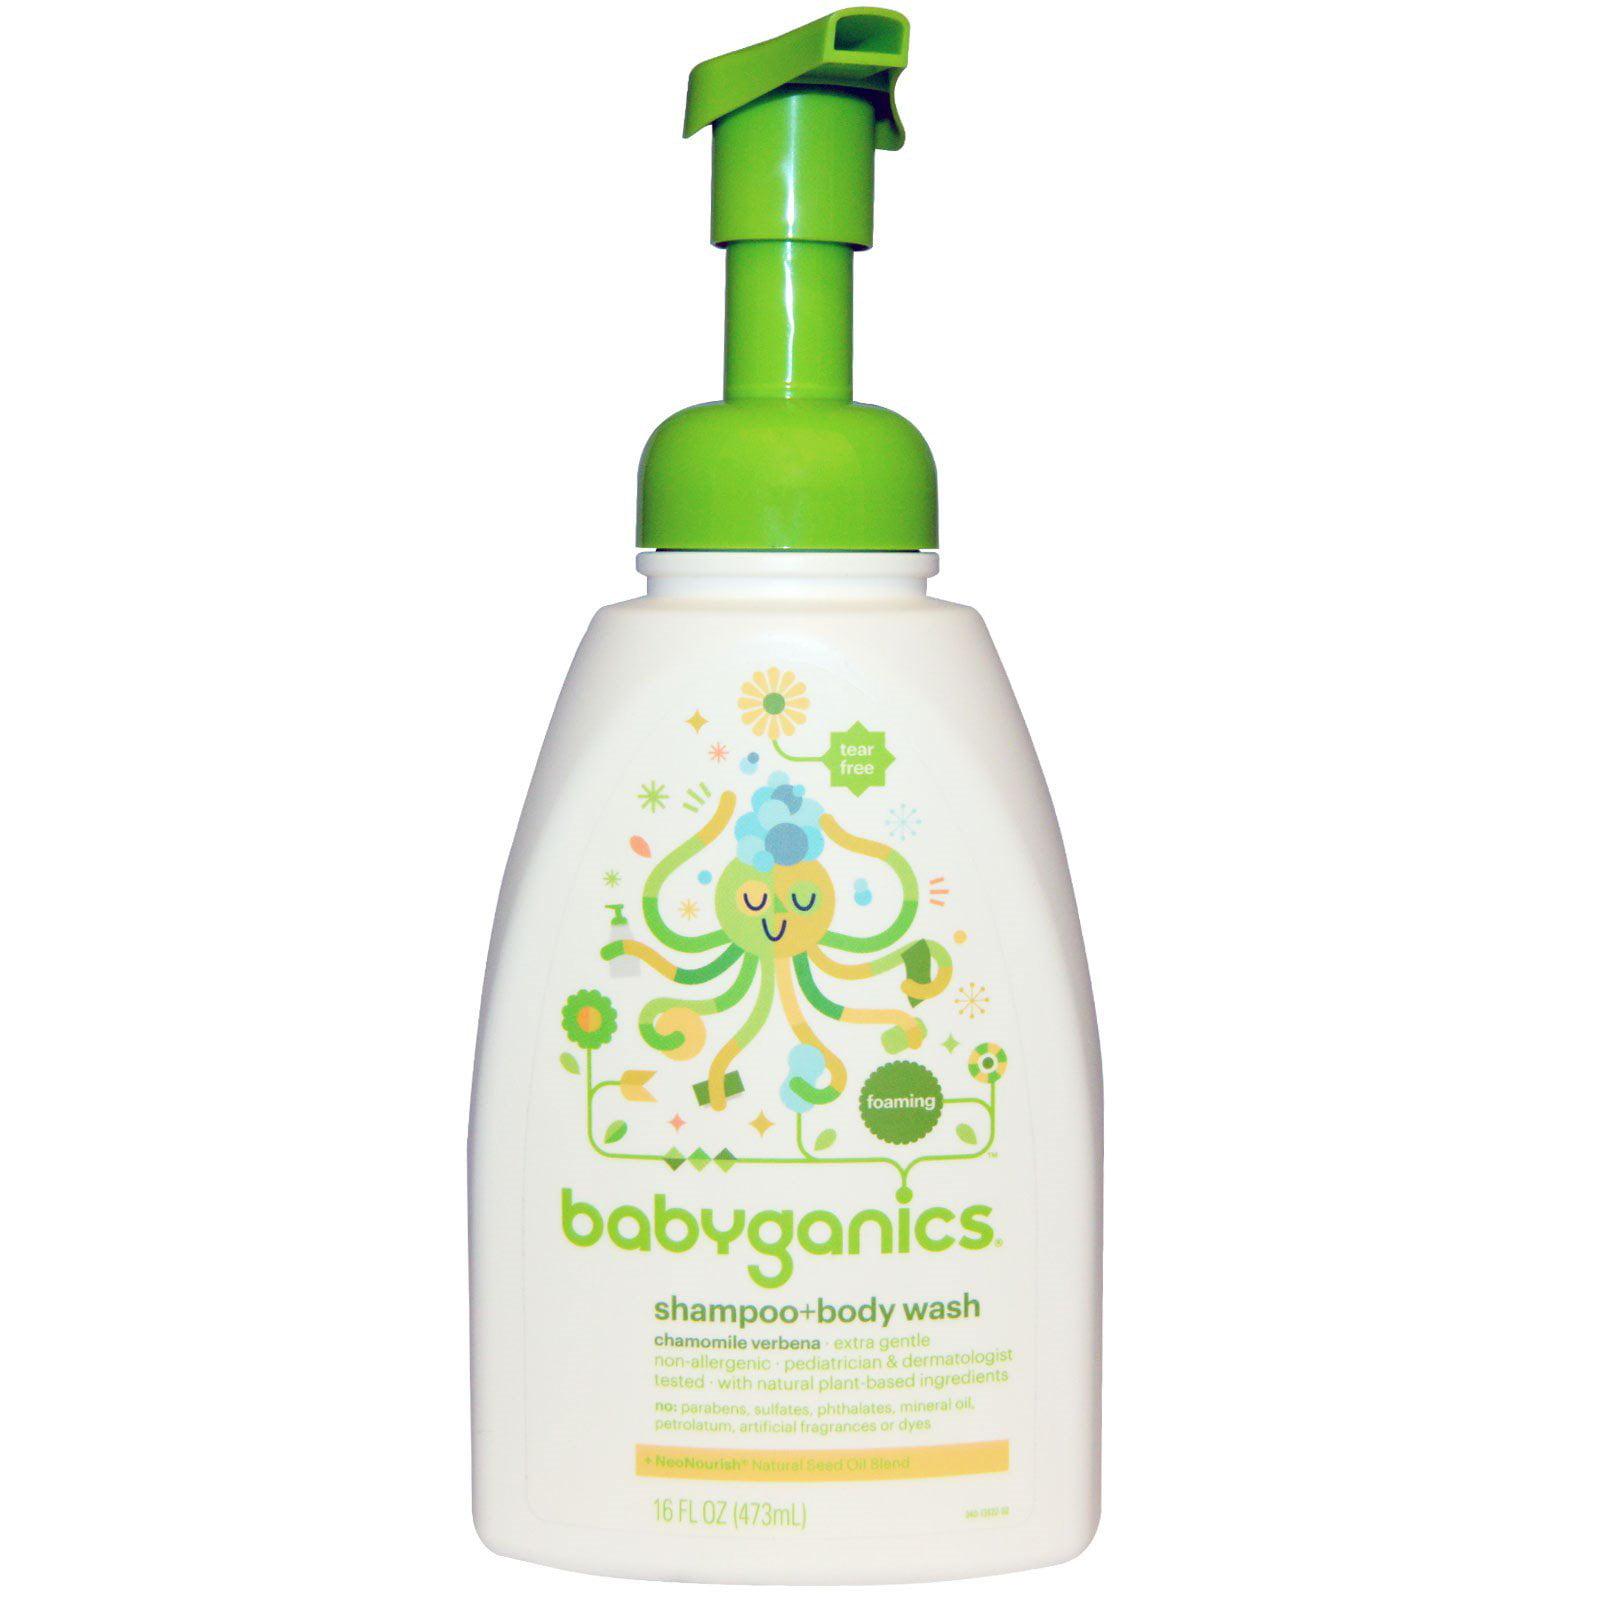 BabyGanics, Shampoo + Bodywash, Chamomile Verbena, 16 fl oz (pack of 6) by